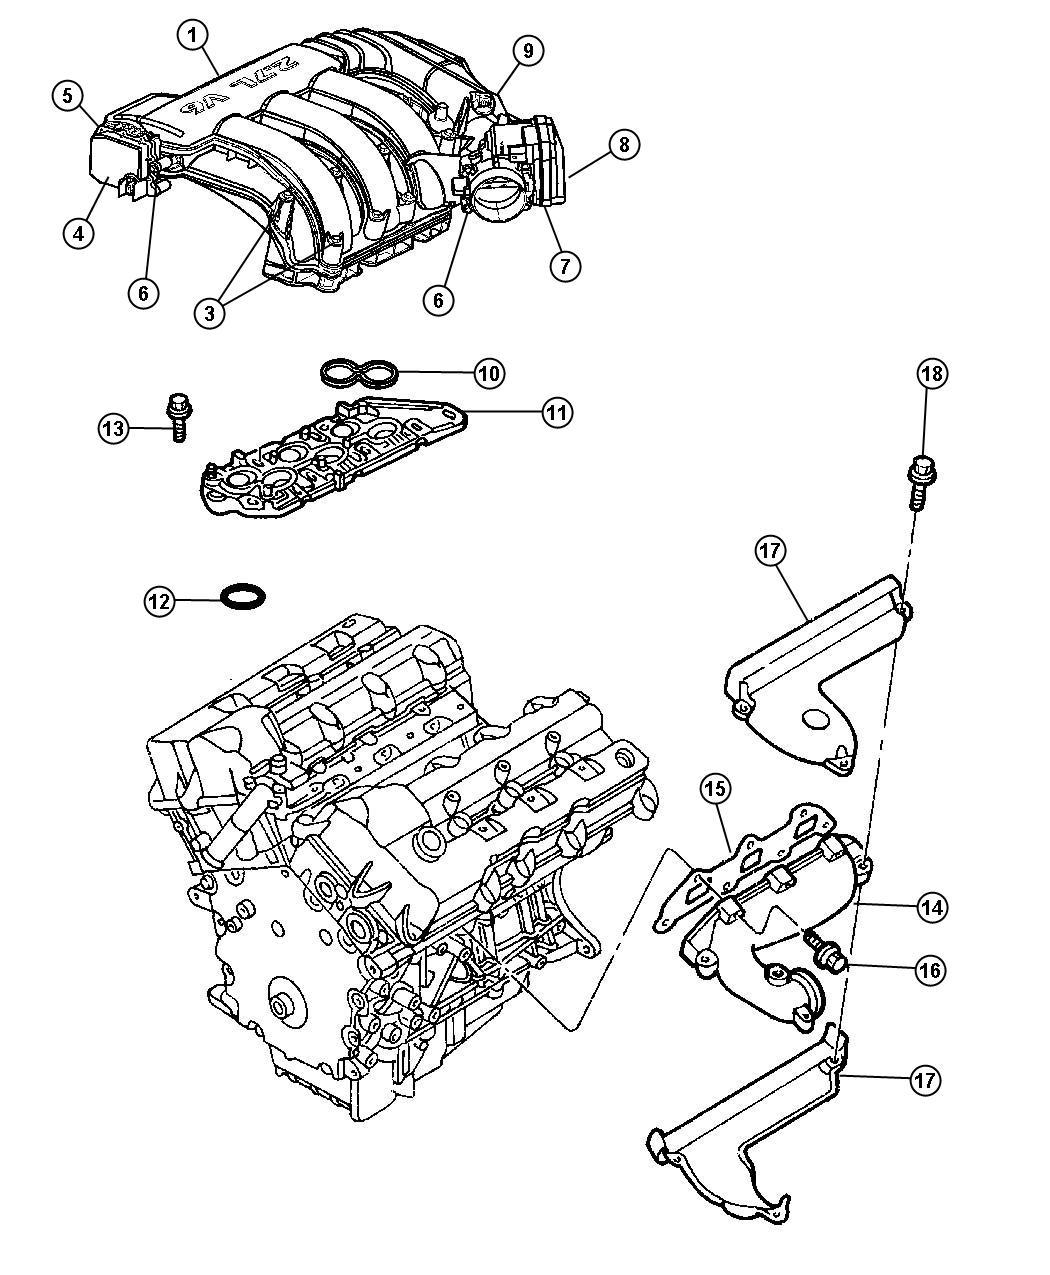 2007 Dodge Magnum Pad  Engine  Foam  Eer  Intake  Manifold